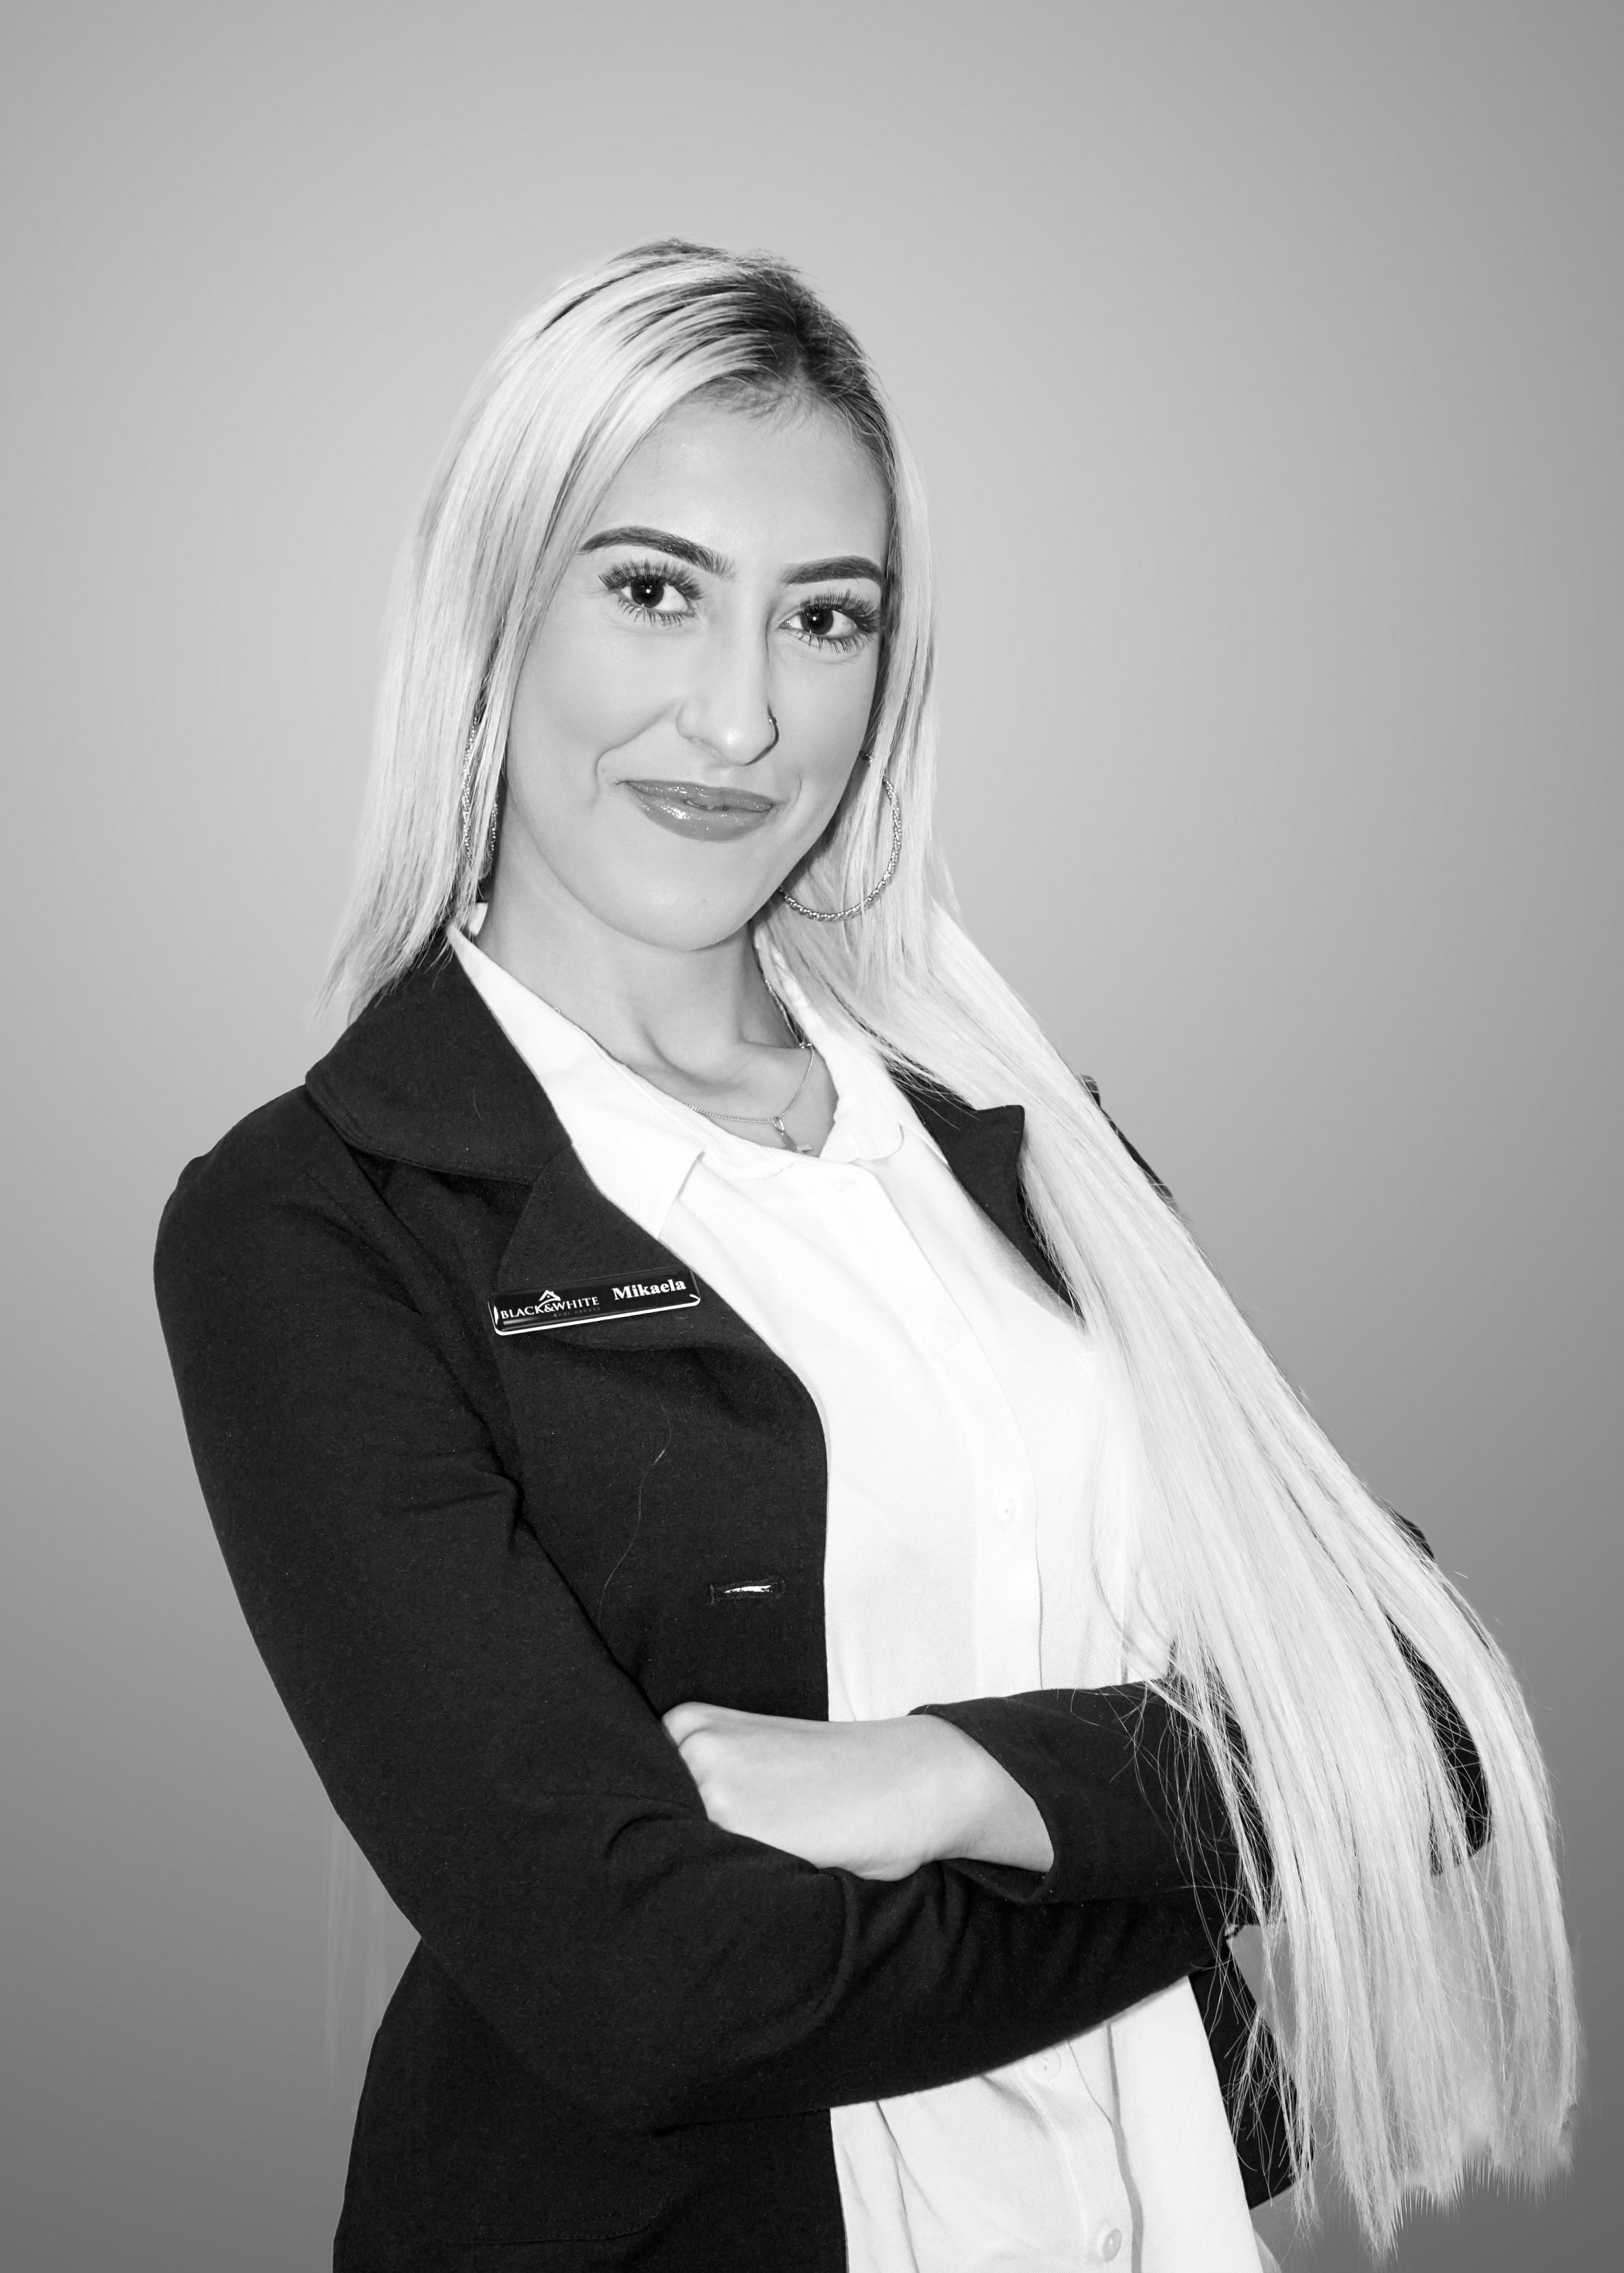 Mikaela Velevski